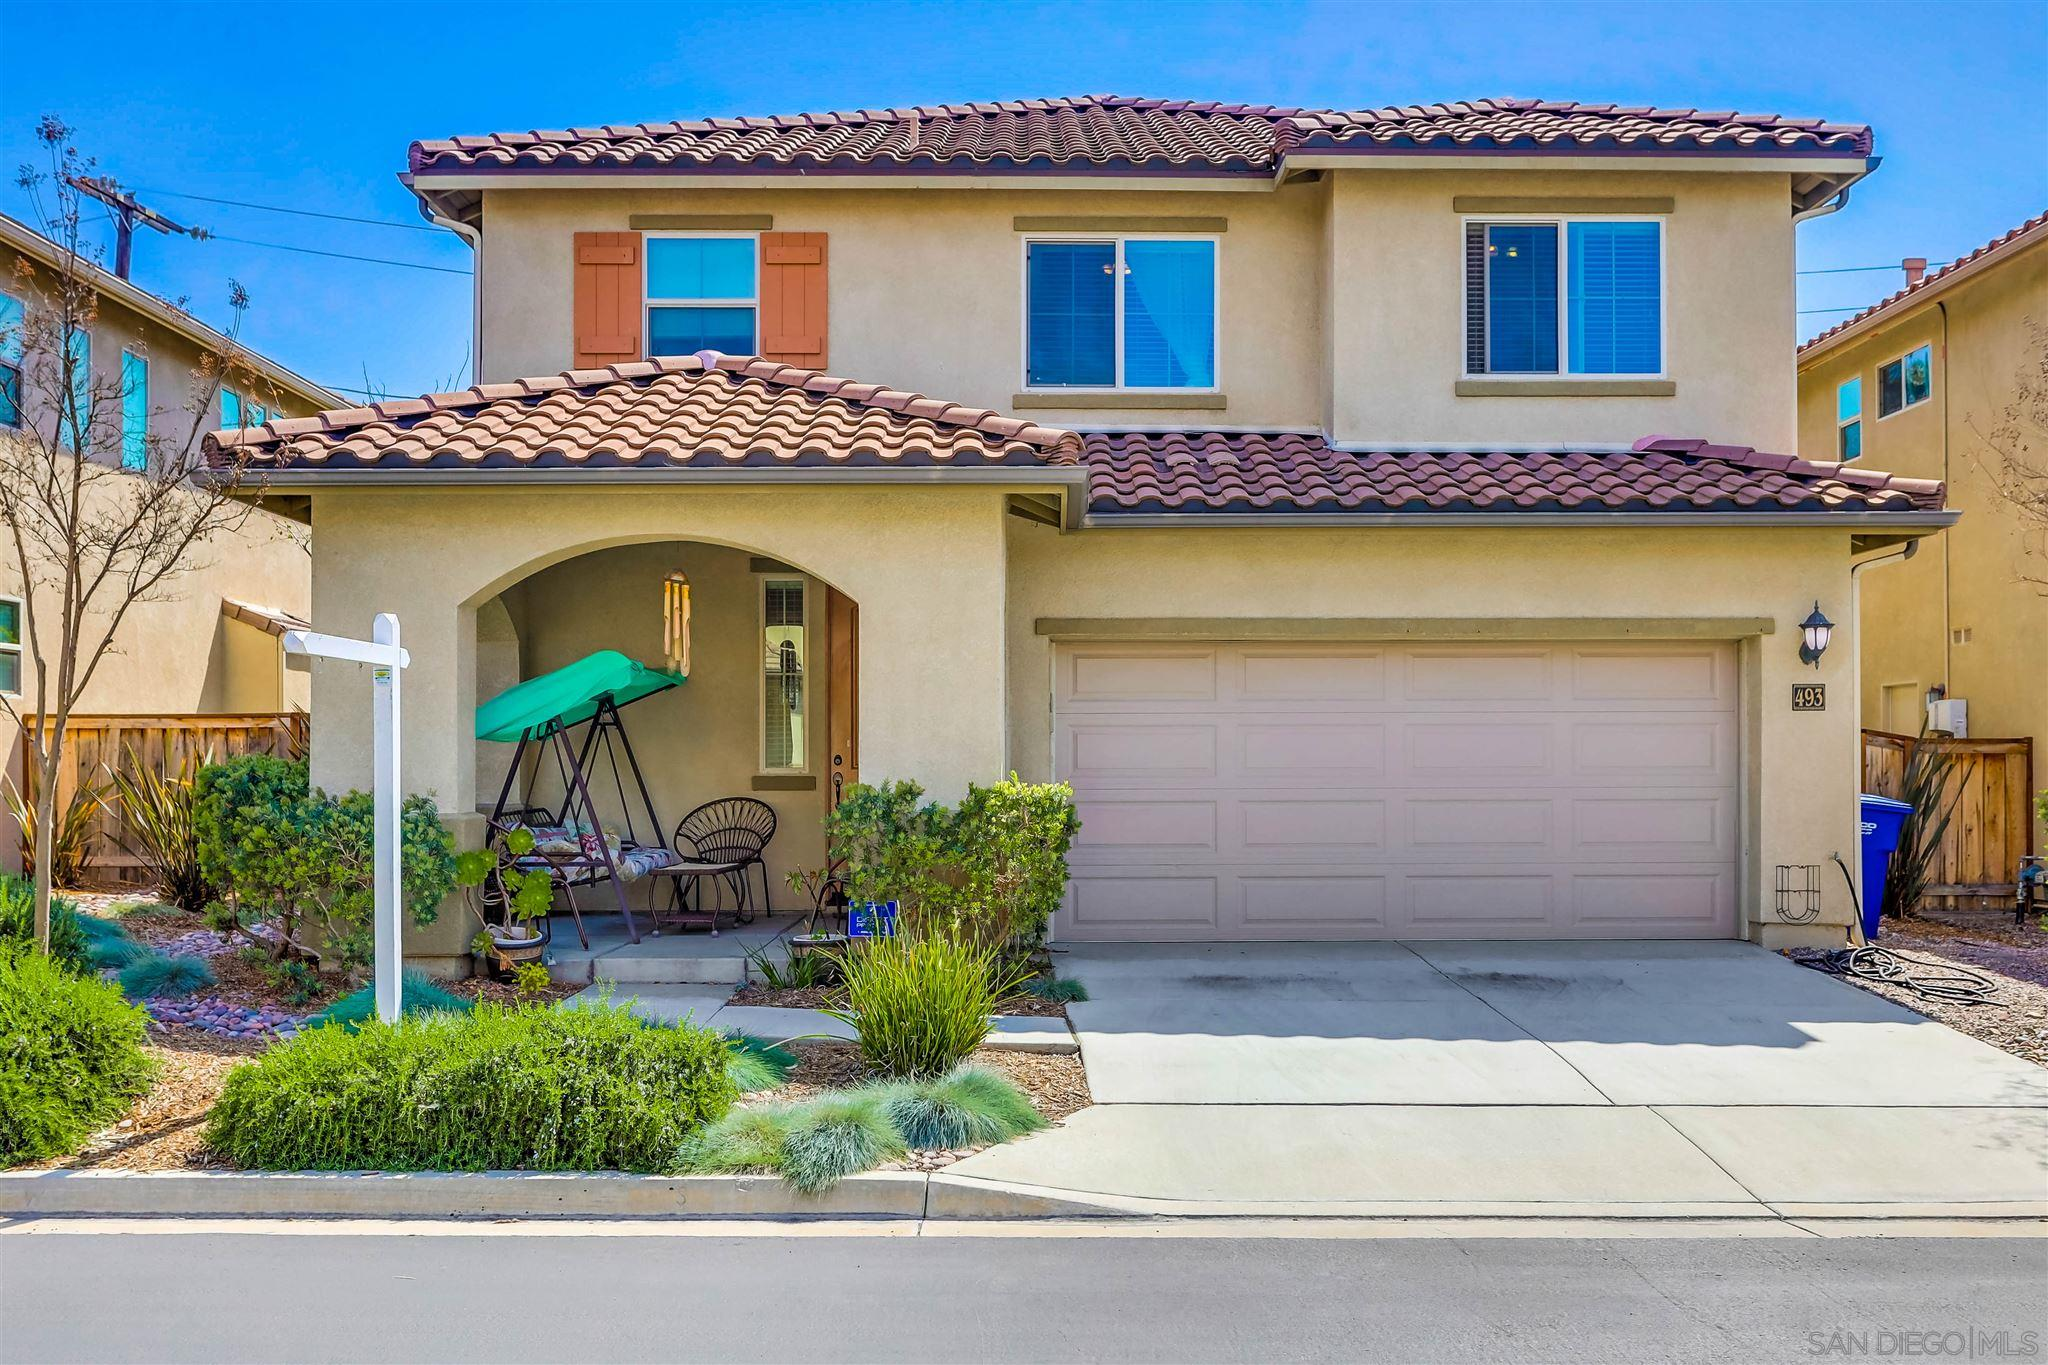 493 Birchwood Lane, El Cajon, California 92021, 4 Bedrooms Bedrooms, ,3 BathroomsBathrooms,Single Family,For Sale,493 Birchwood Lane,2,210007879